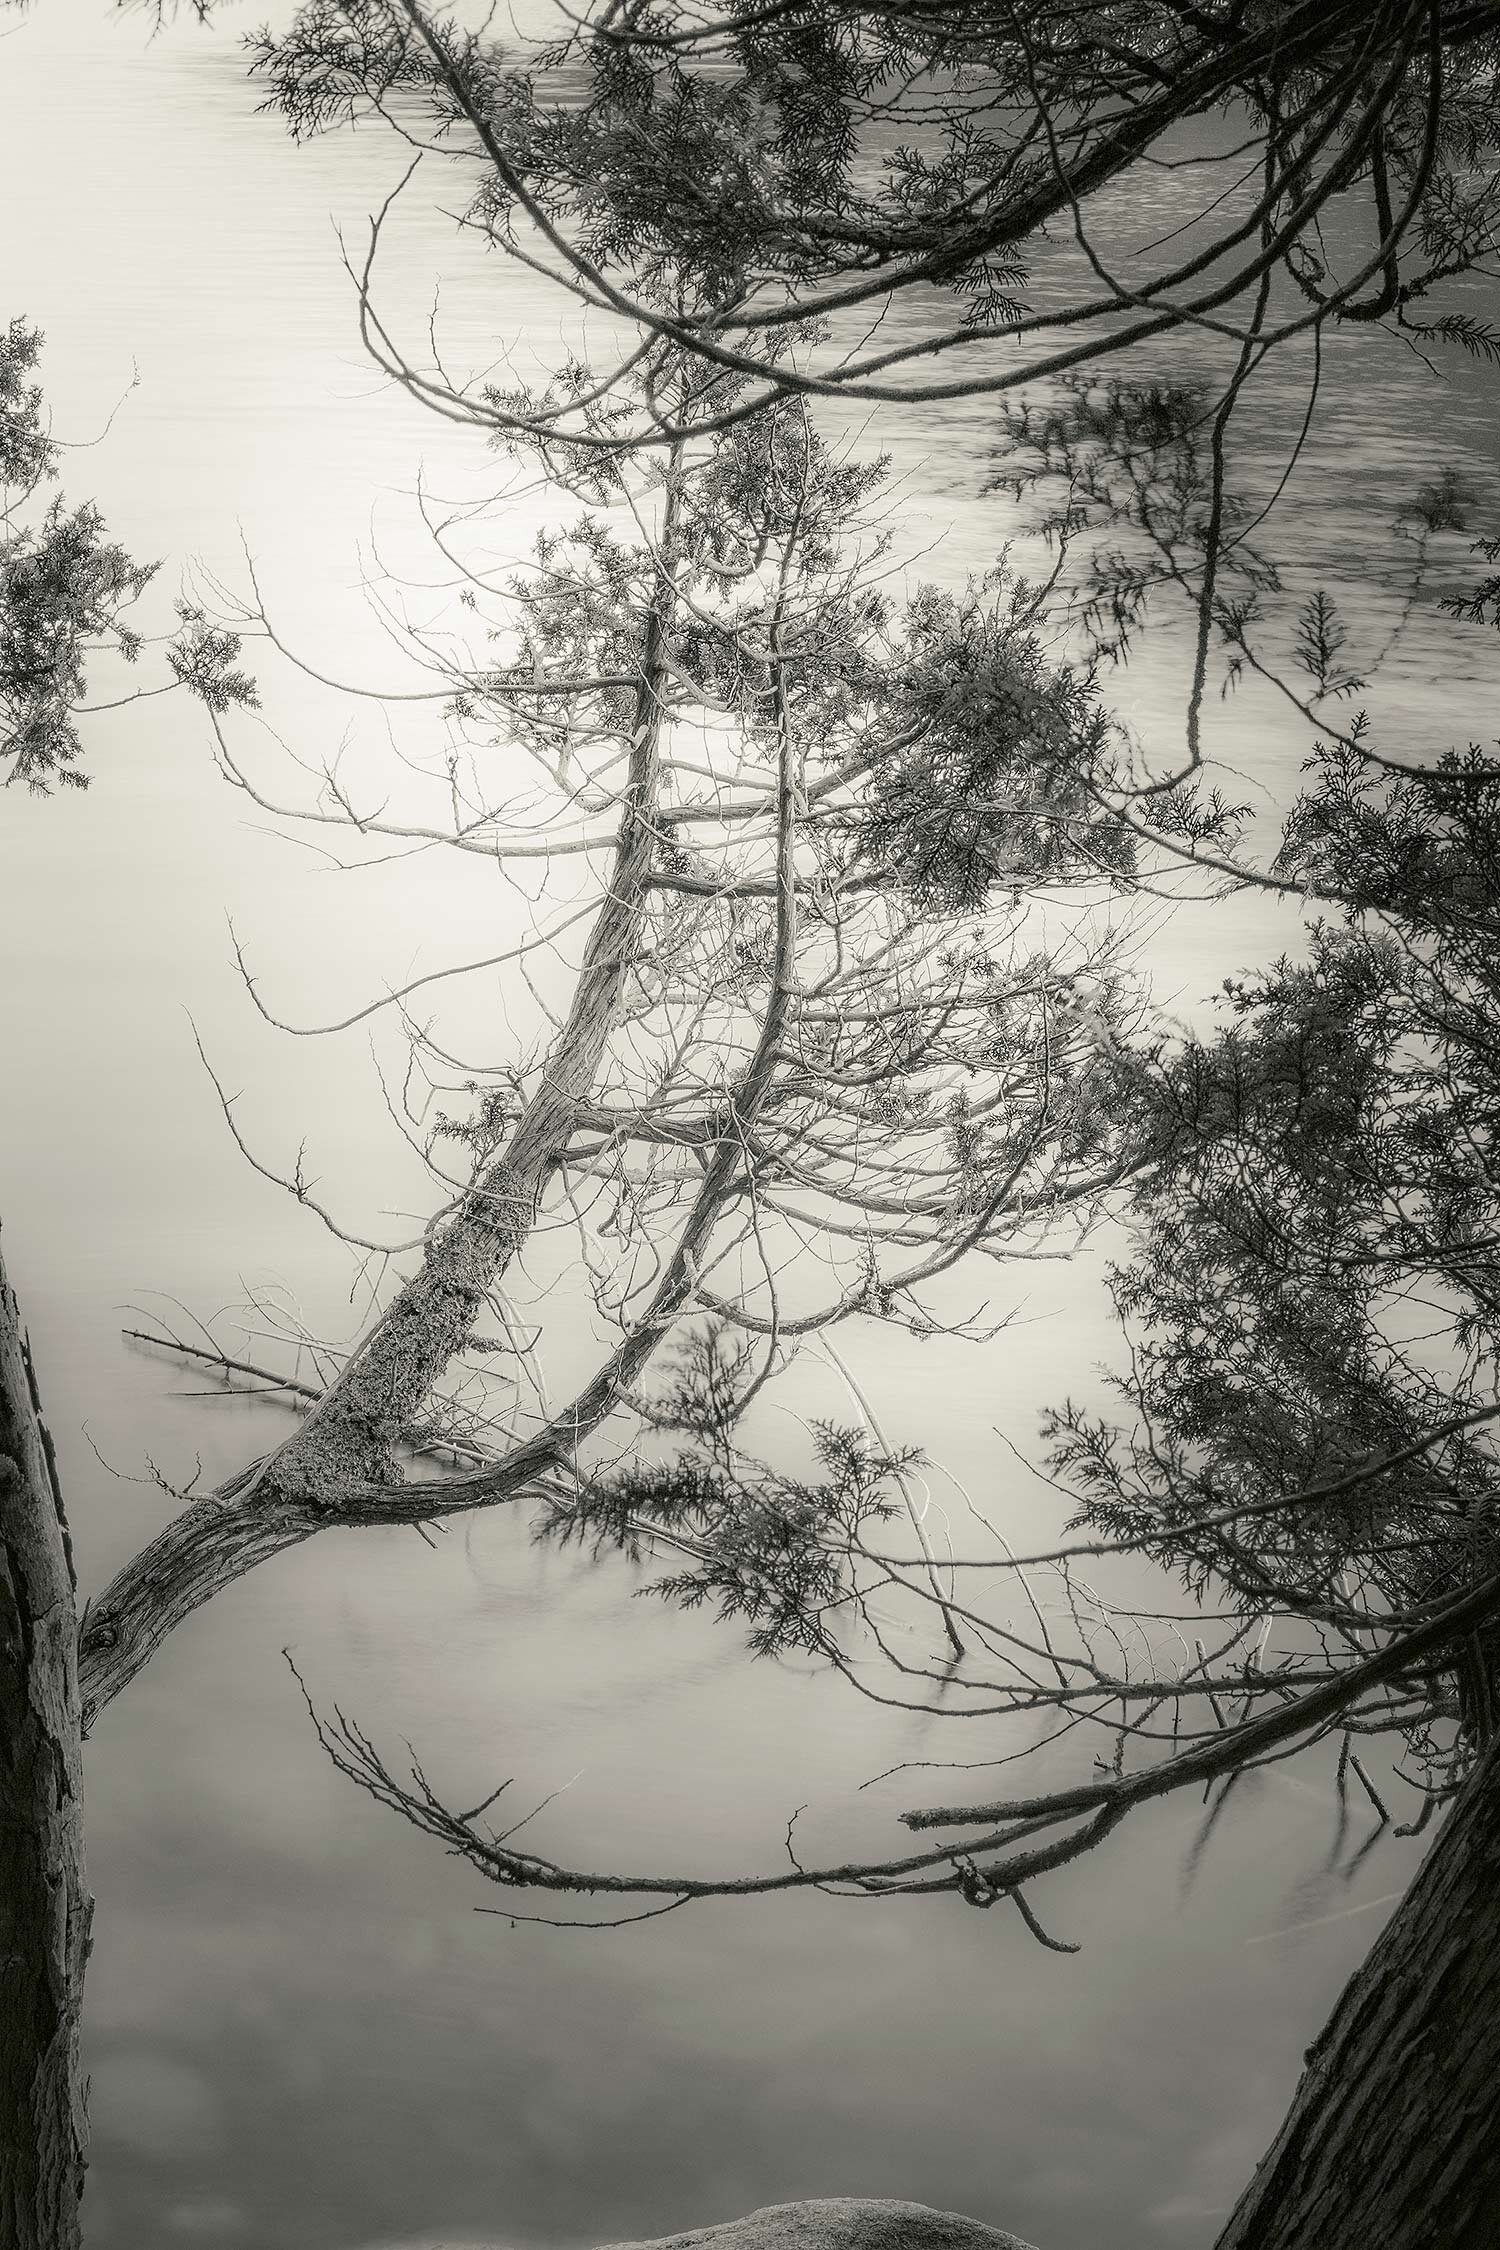 Long Pond, Acadia, 2013